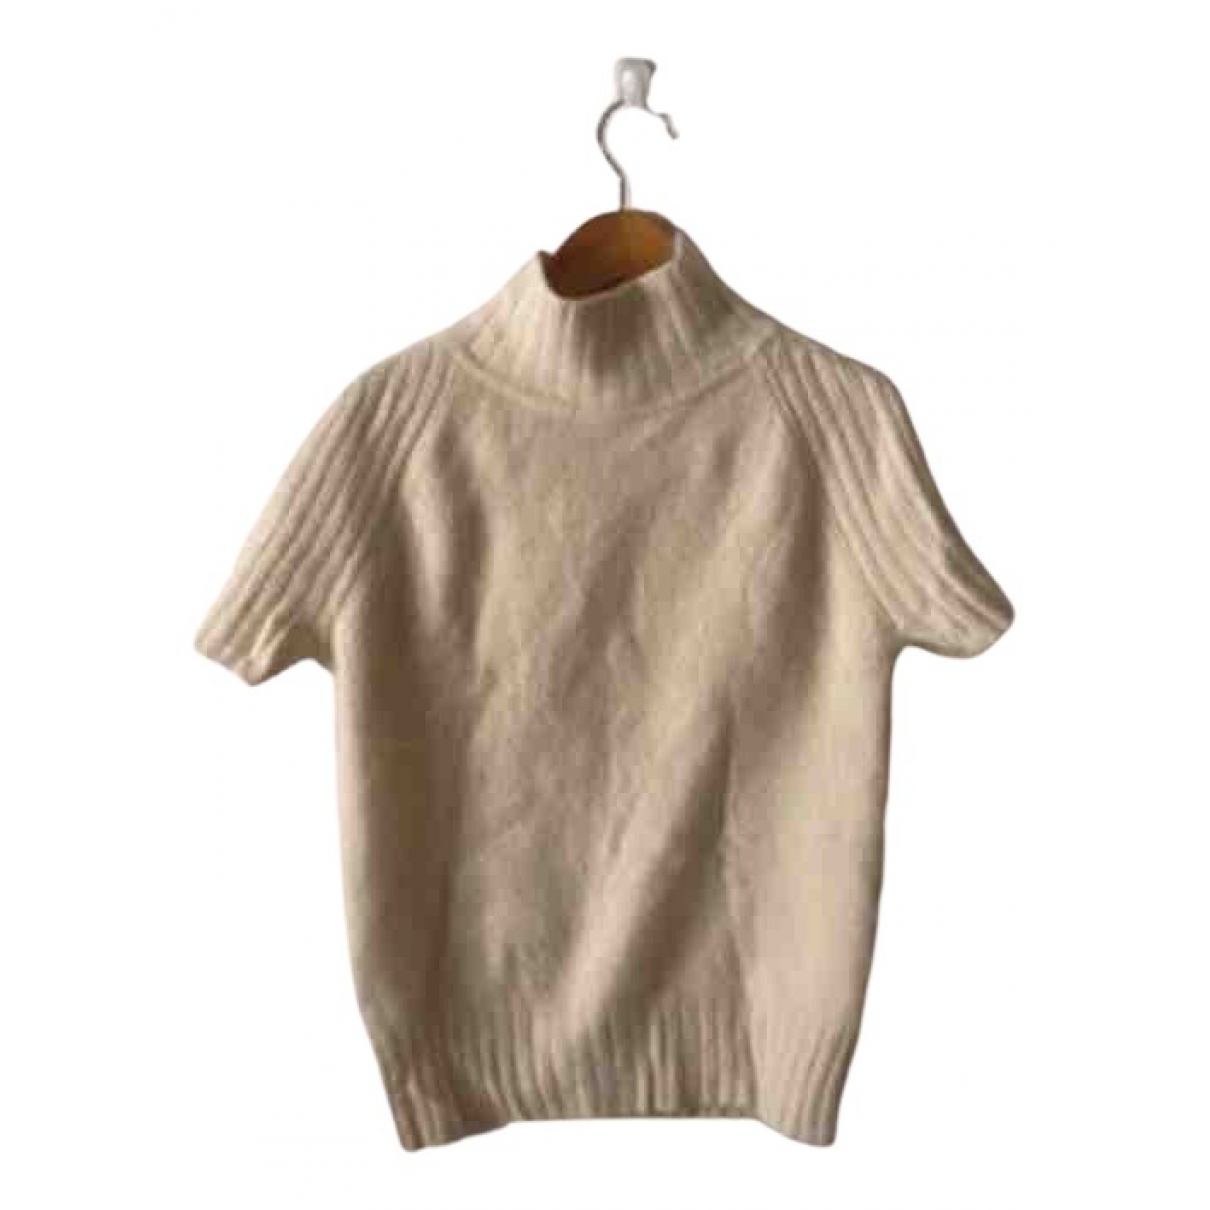 Mugler N Beige Cashmere Knitwear for Women 40 FR